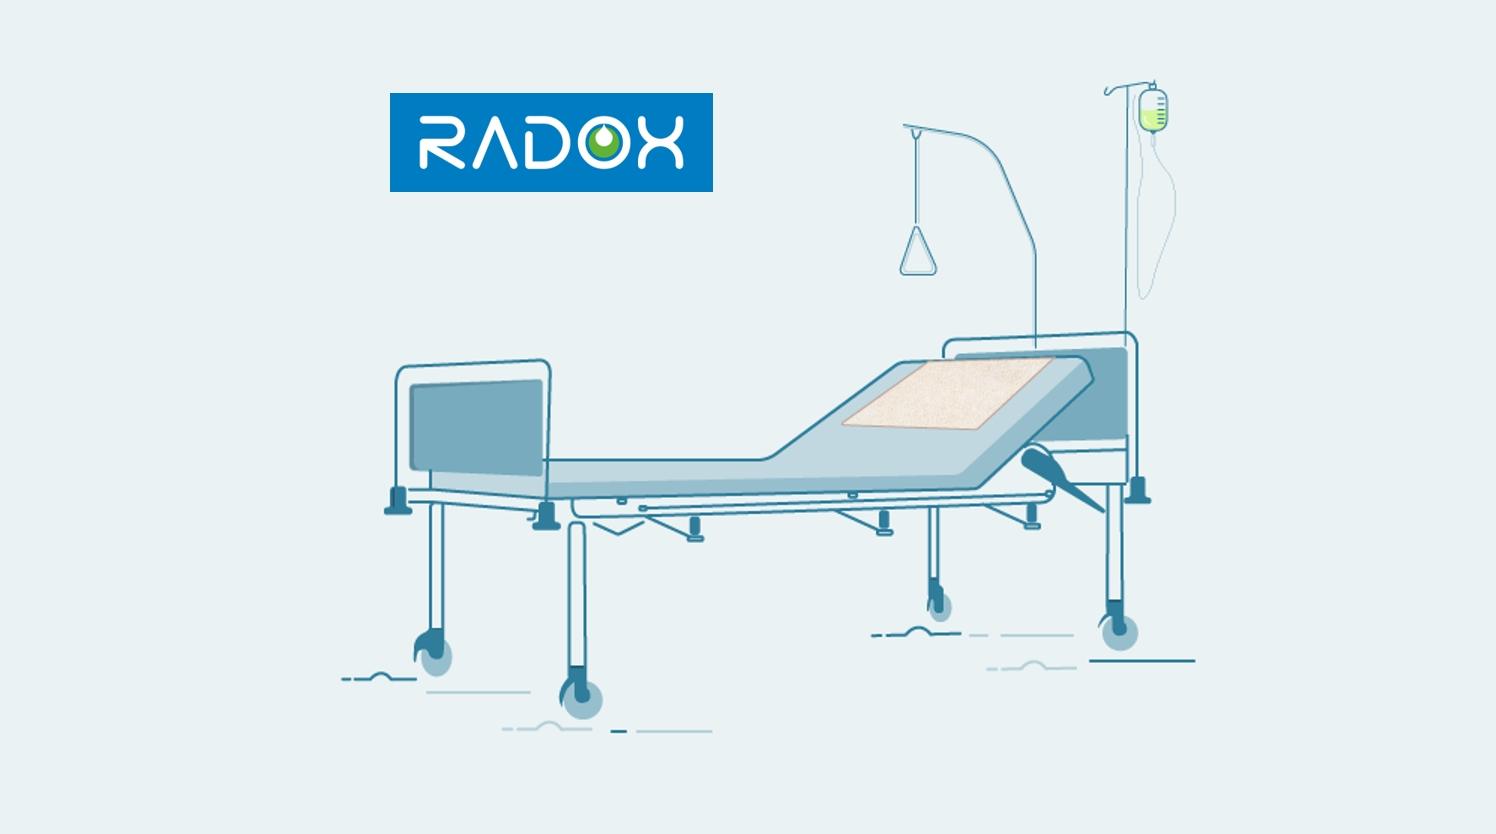 Paturi_de_spital_Radoxlab_Romania_1